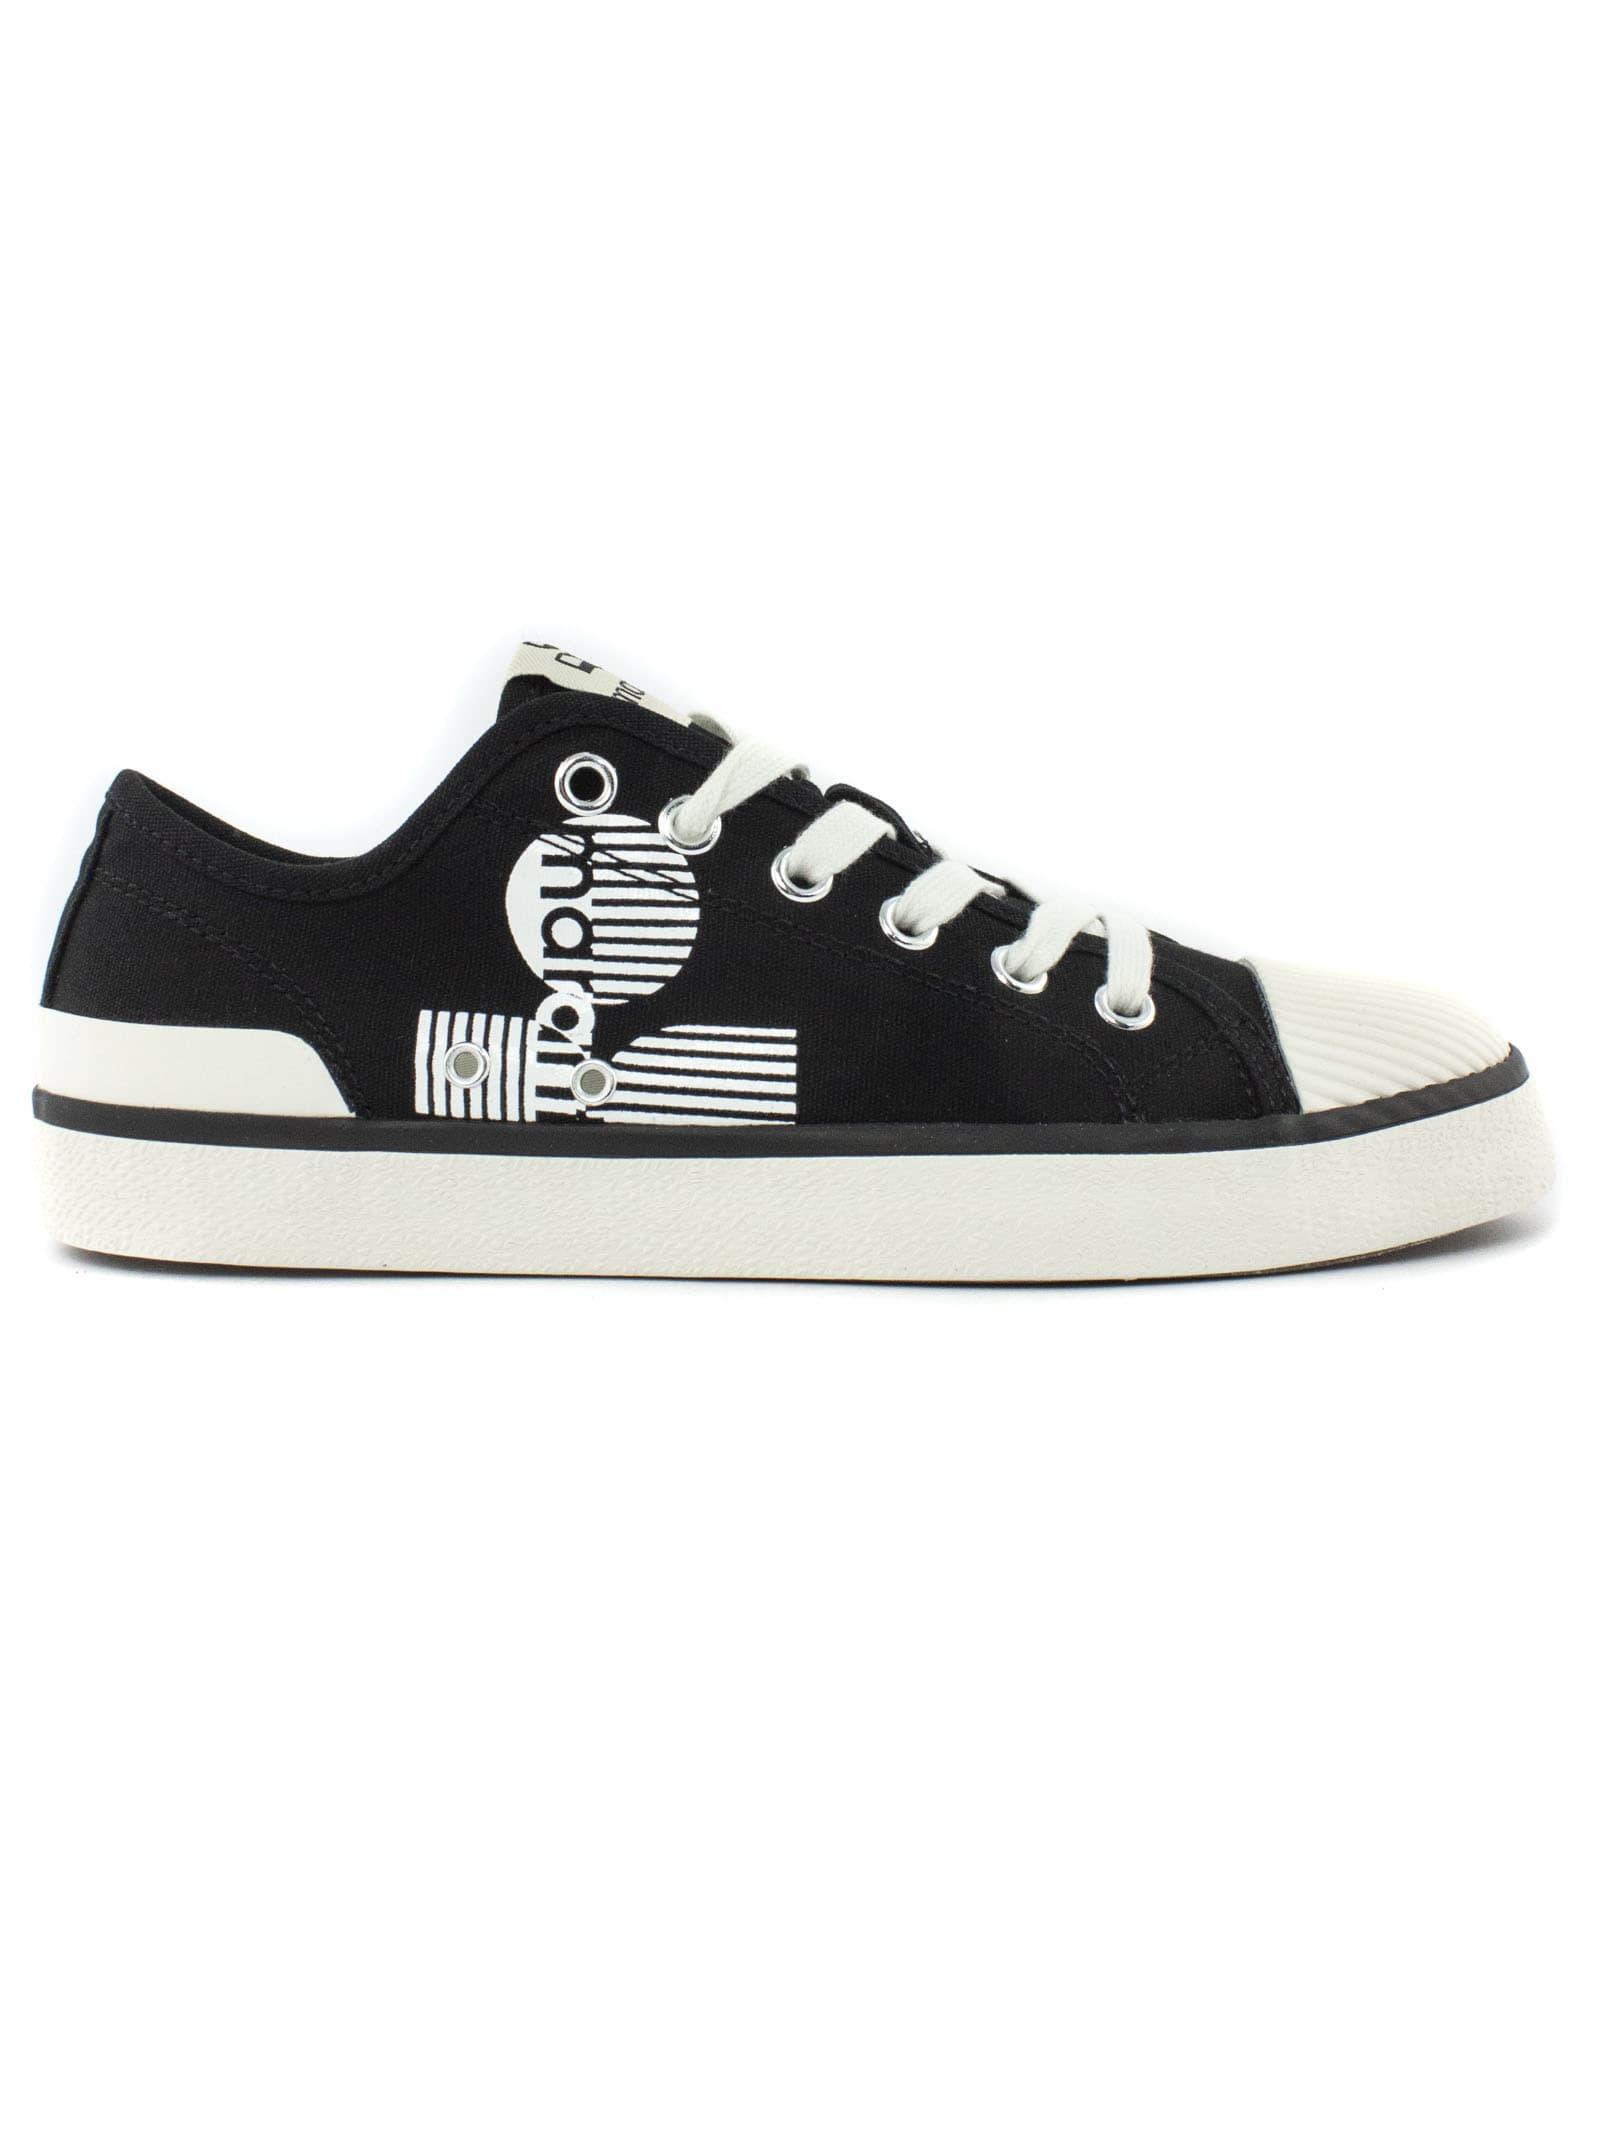 Isabel Marant Black Cotton Sneakers